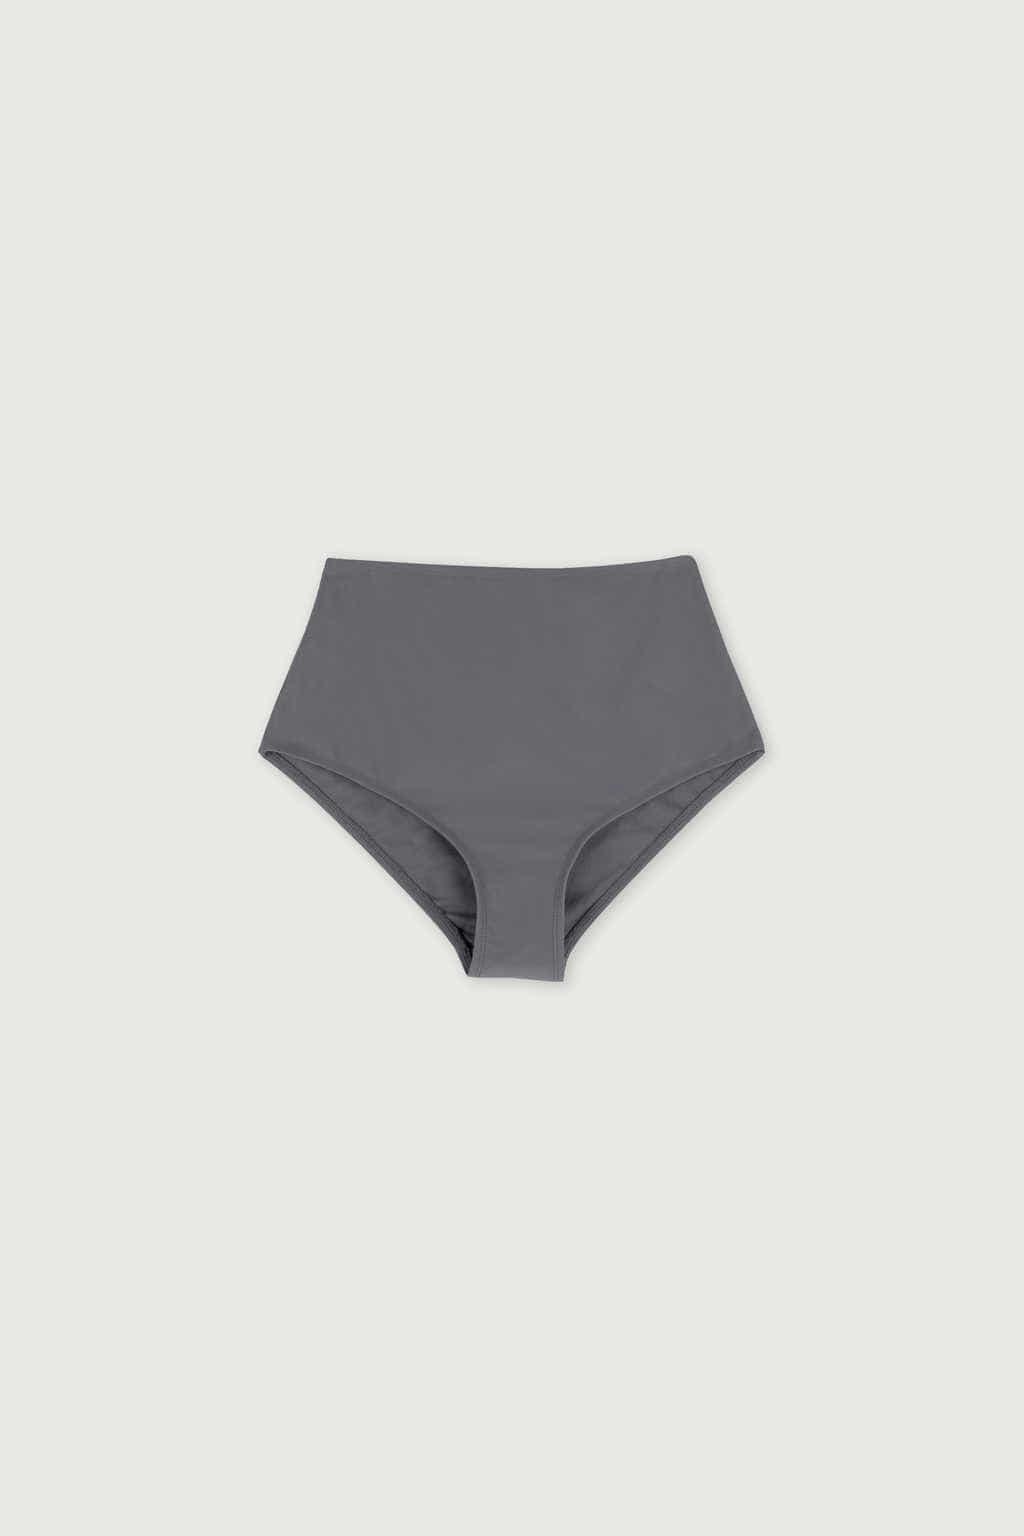 Bikini Bottom 2906 Gray 15